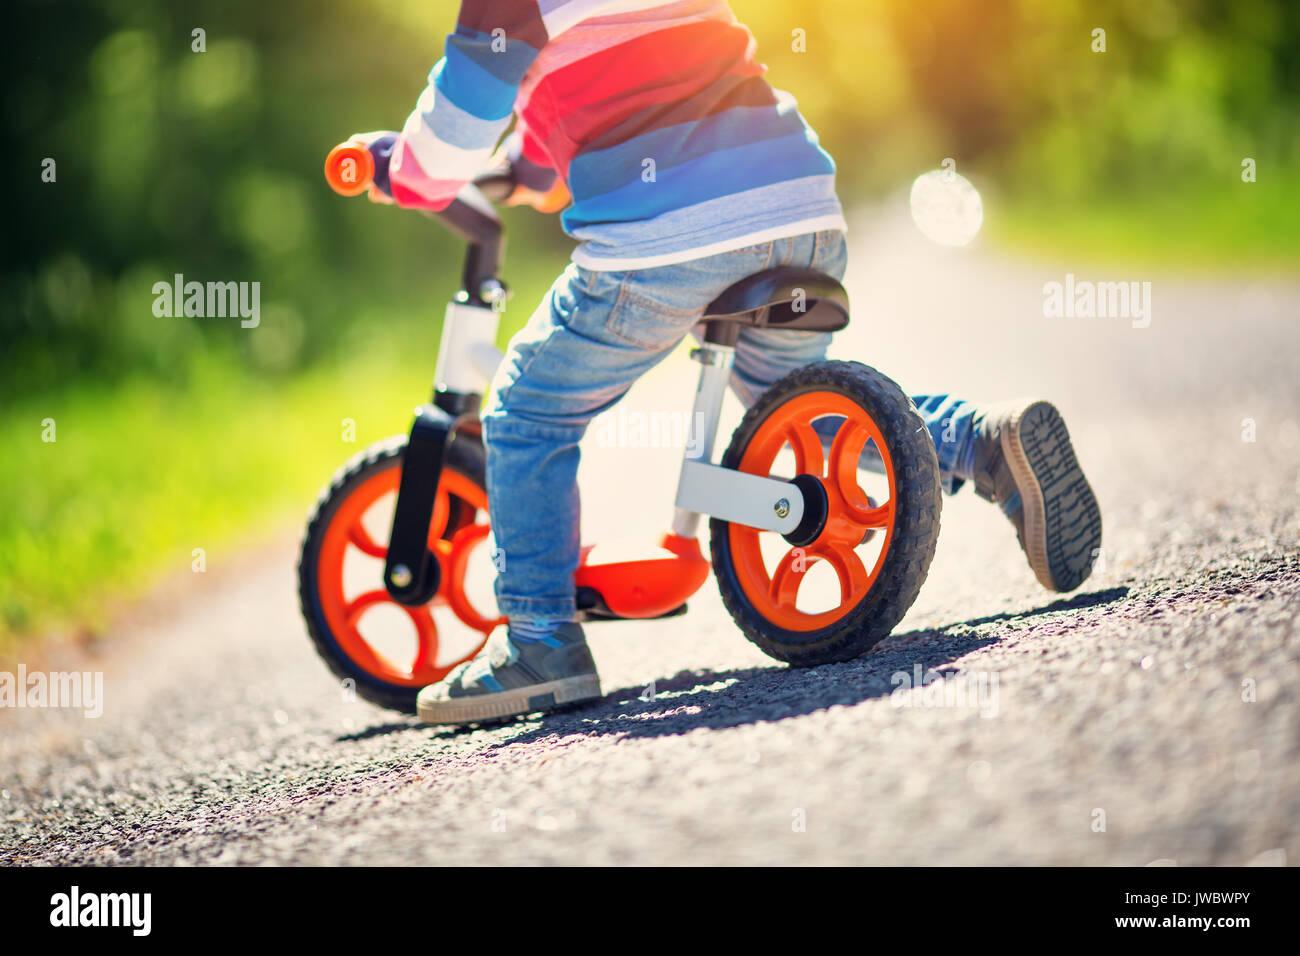 Kinder auf einem Fahrrad Stockbild